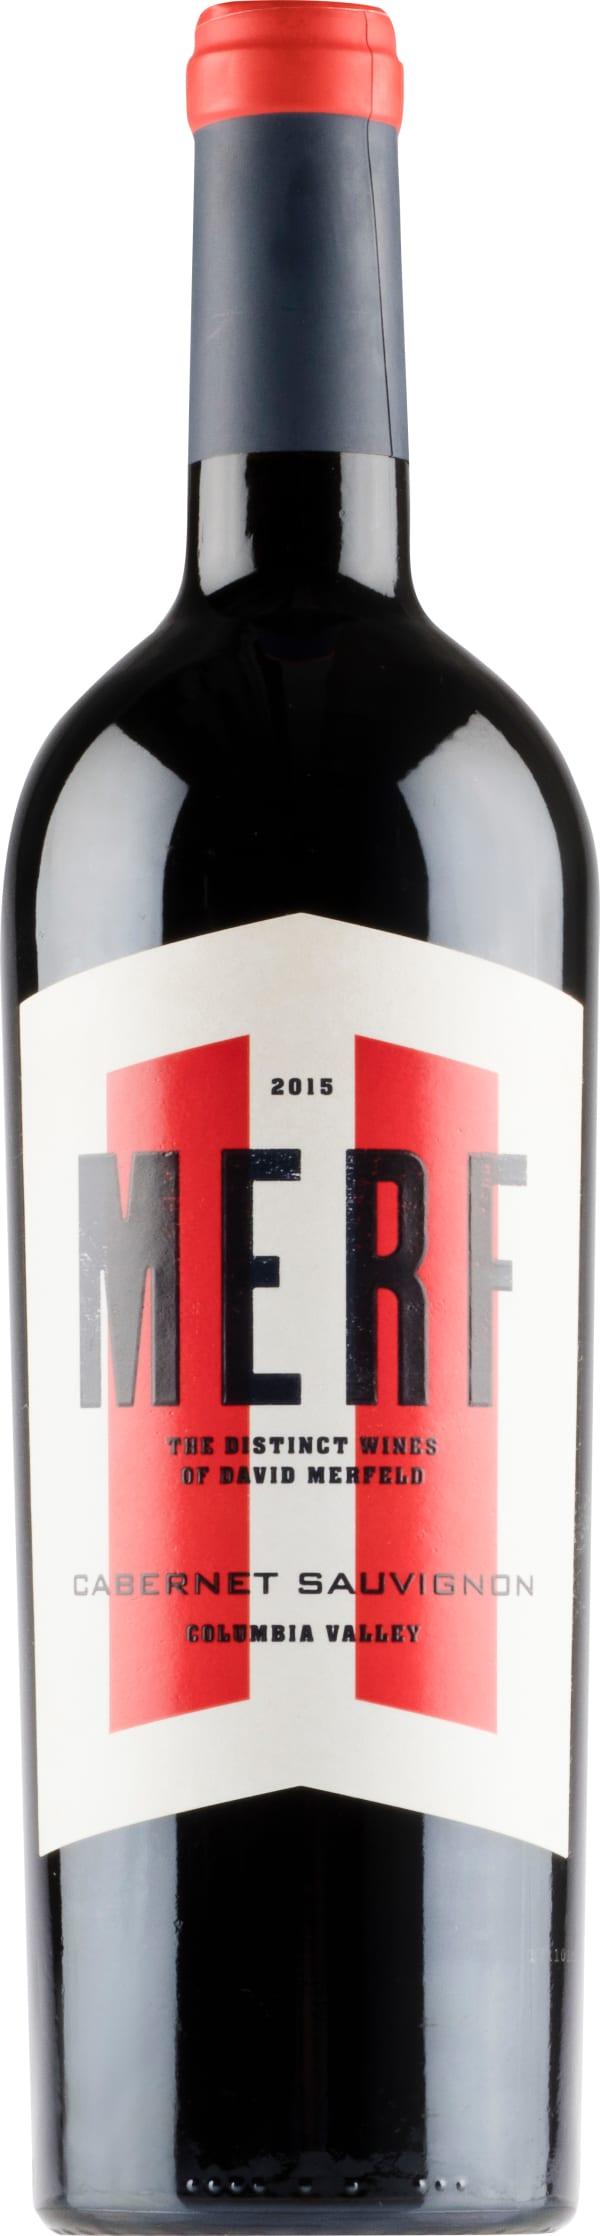 Merf Cabernet Sauvignon 2015